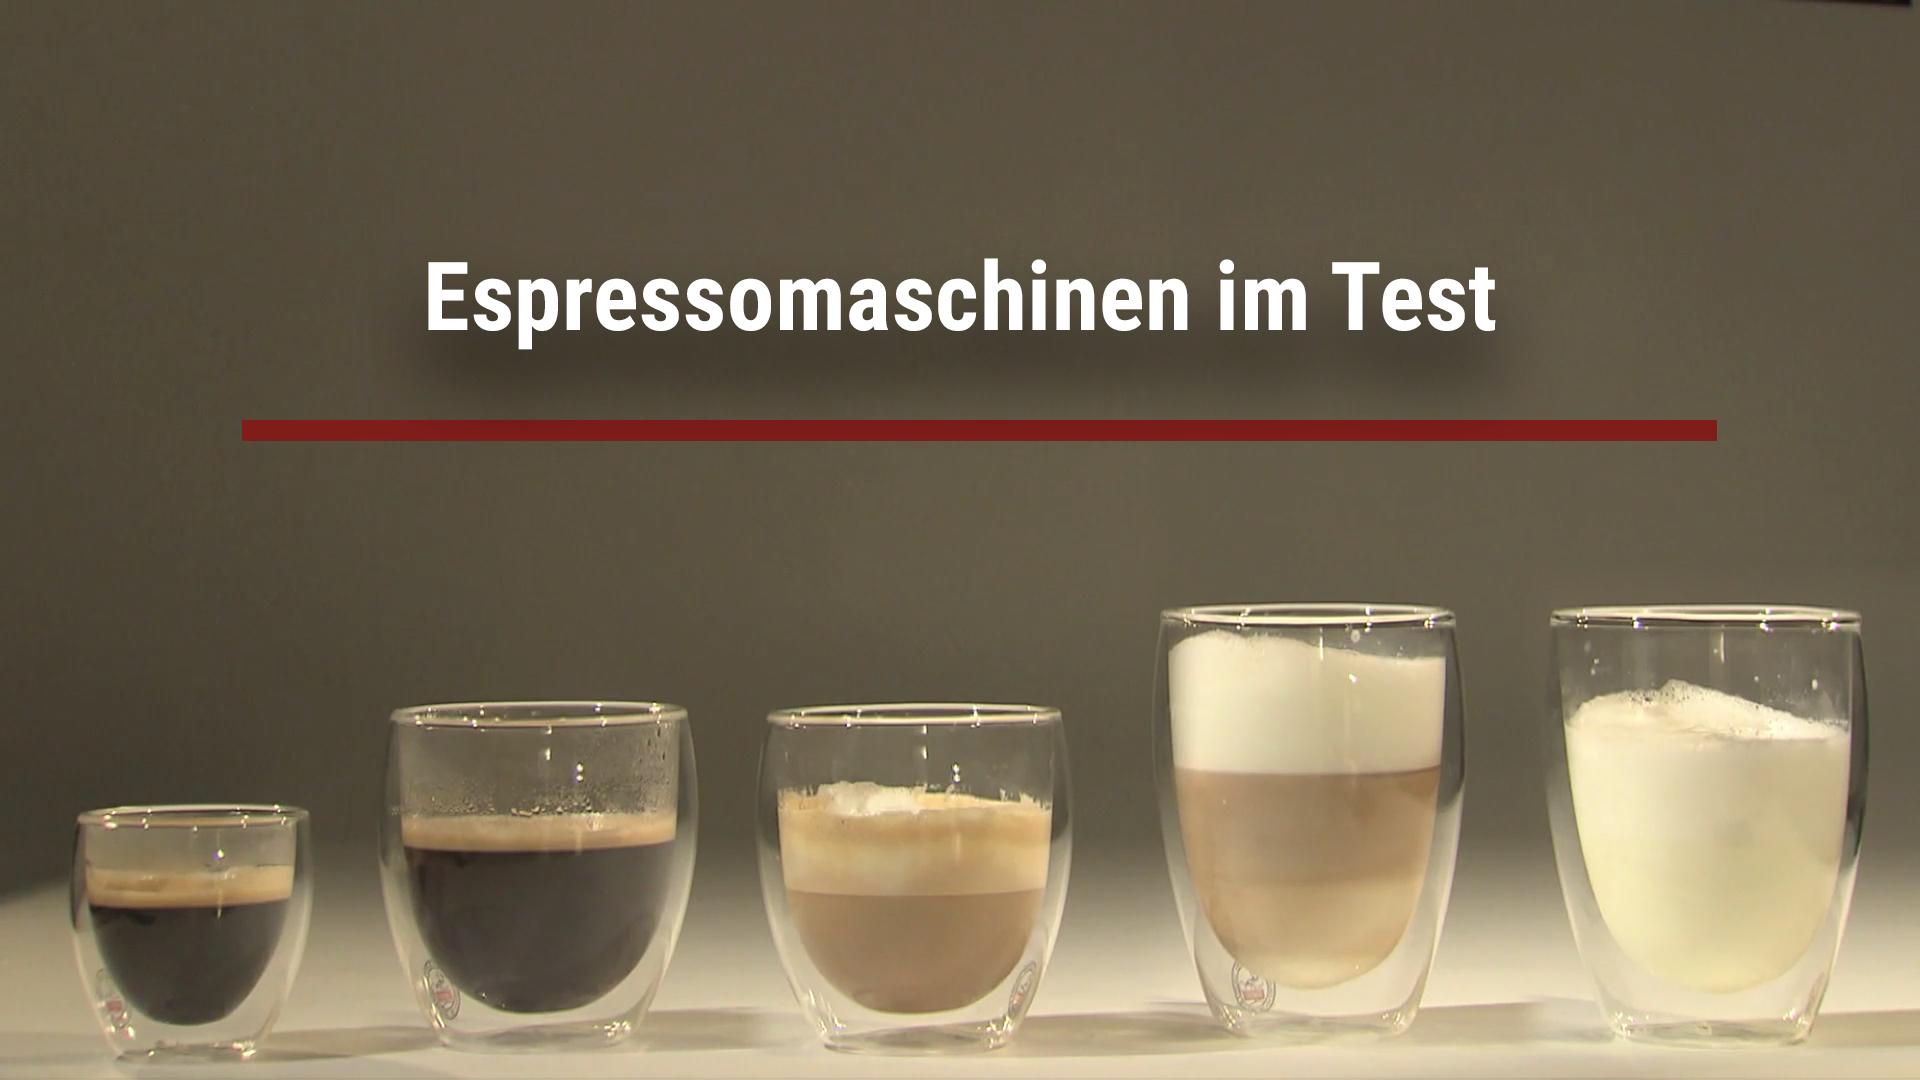 Espresso machines put to the test